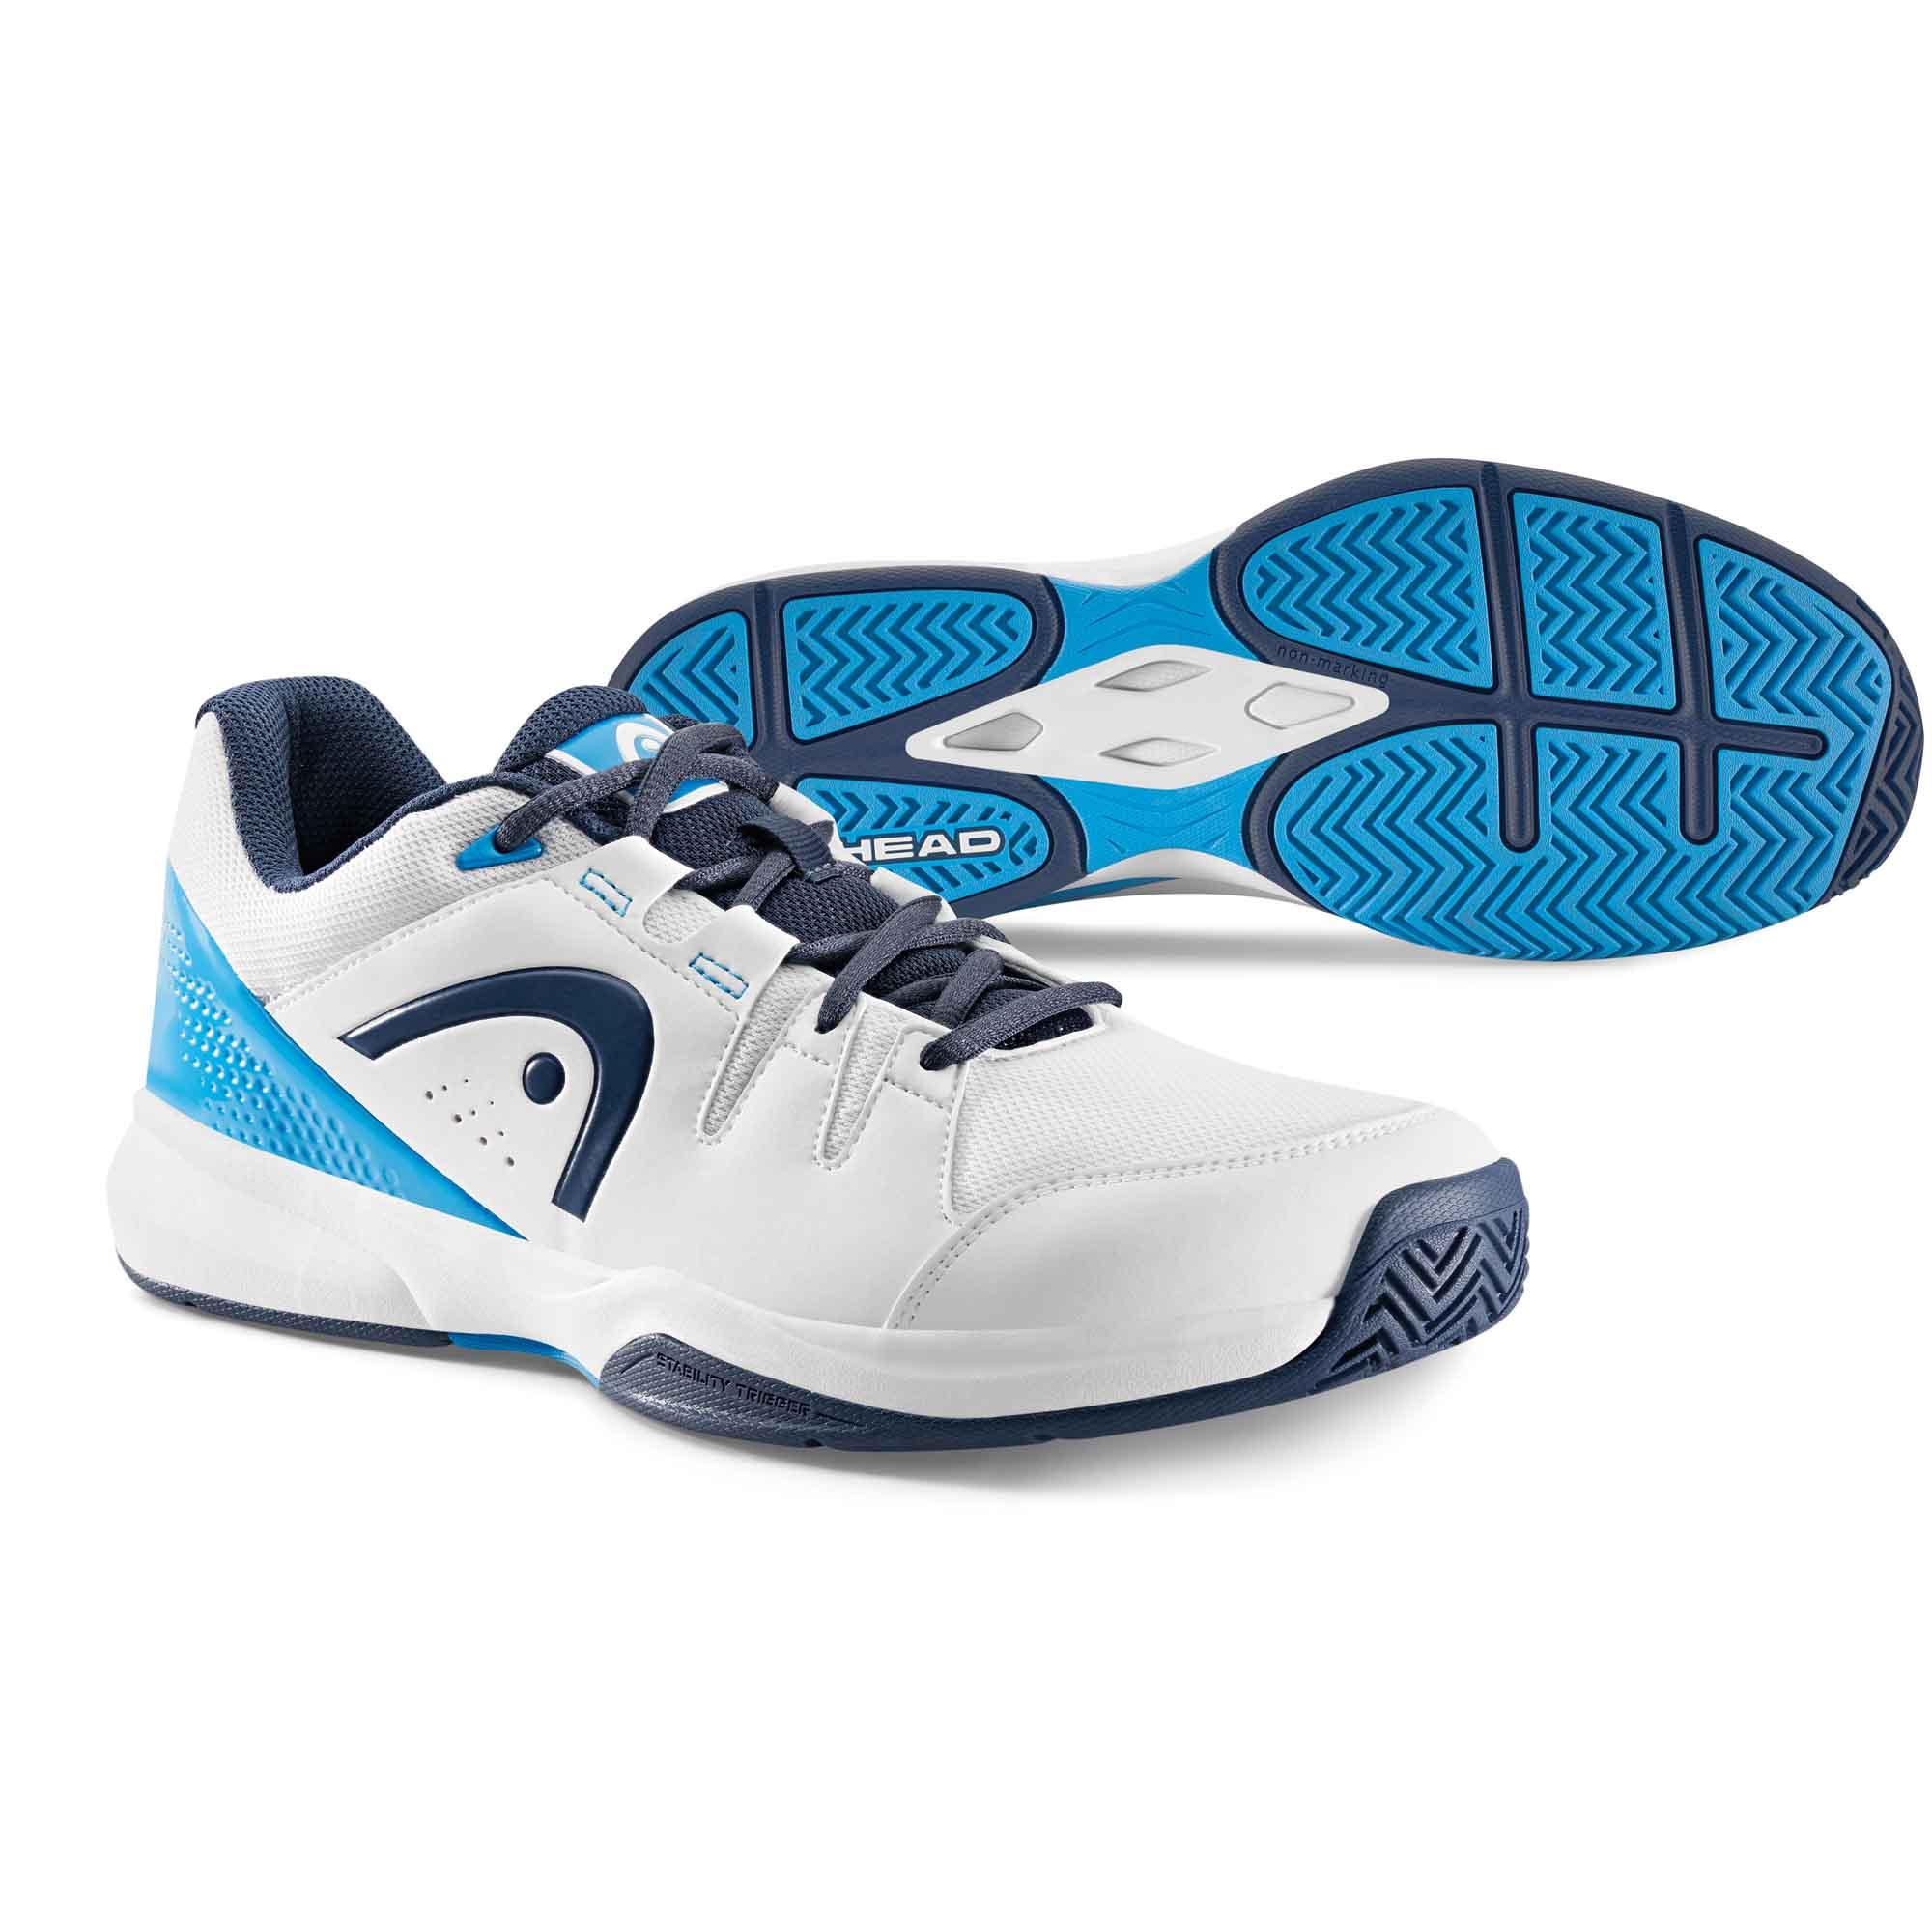 Head Brazer Mens Tennis Shoes  9.5 UK